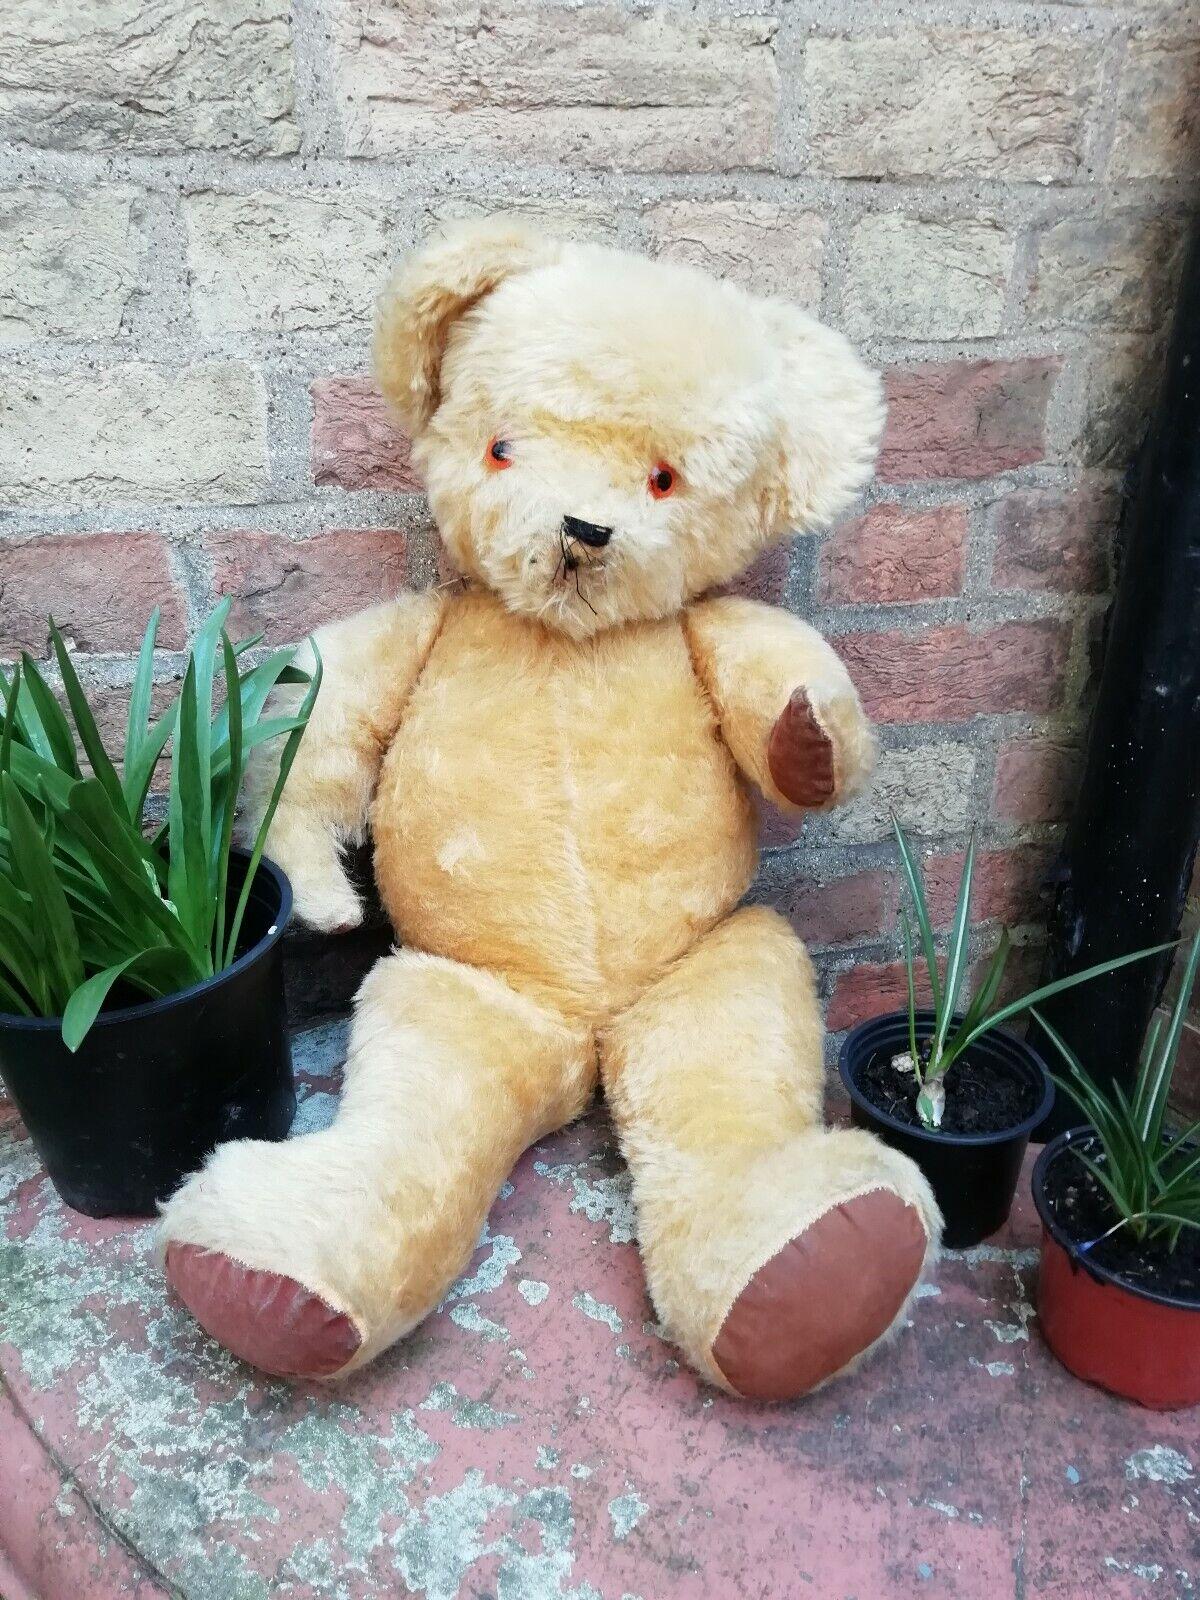 Antico Vintage SNODATA INGLESE GReE 25  oroEN Teddy orso